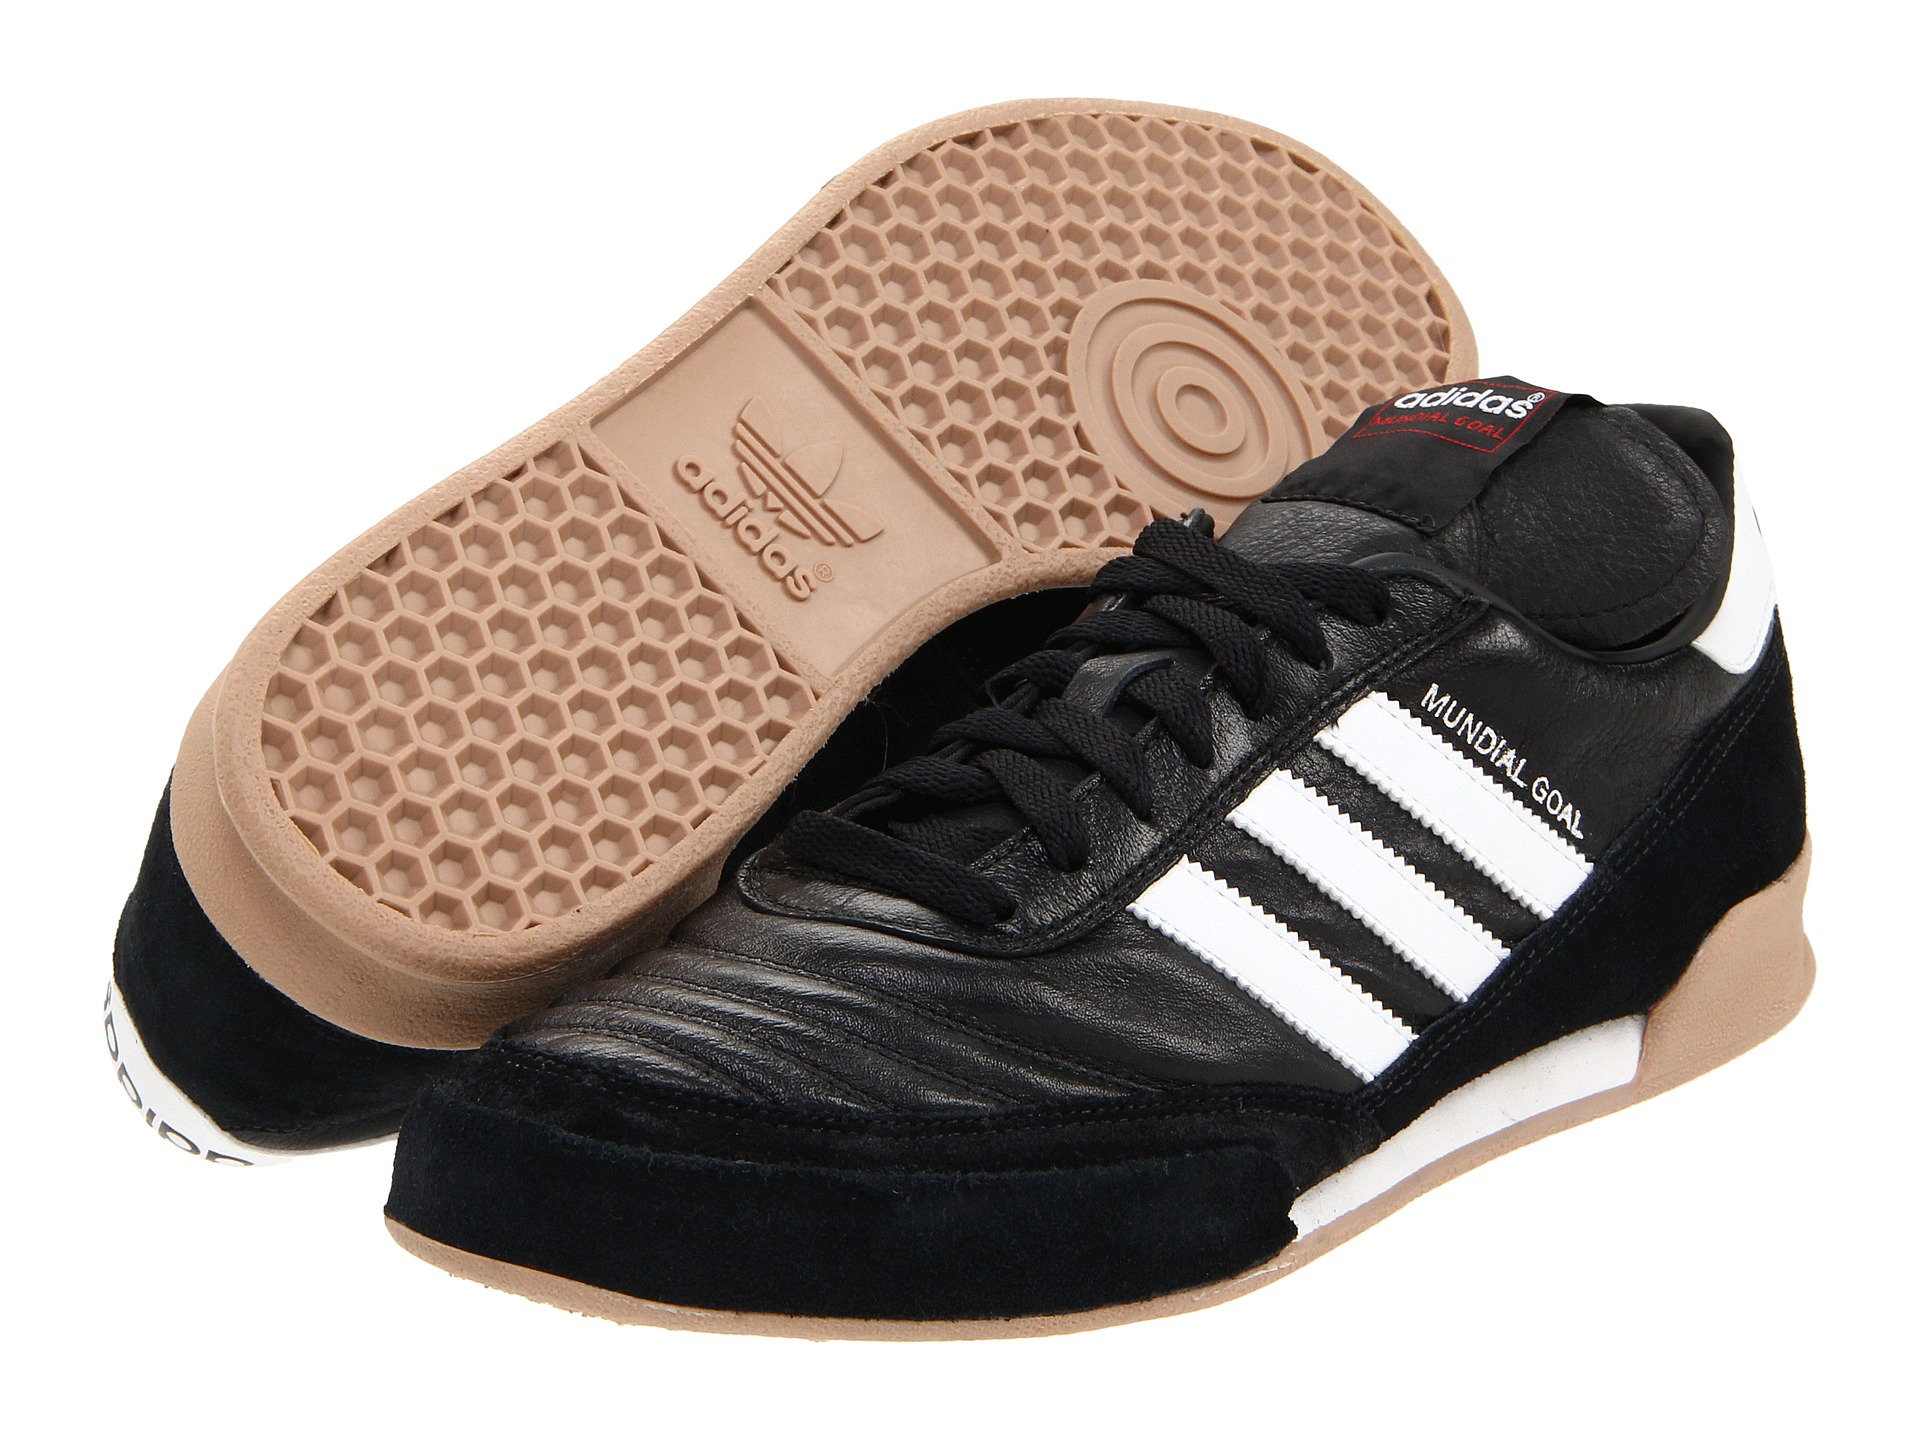 adidas copa mundial indoor boots